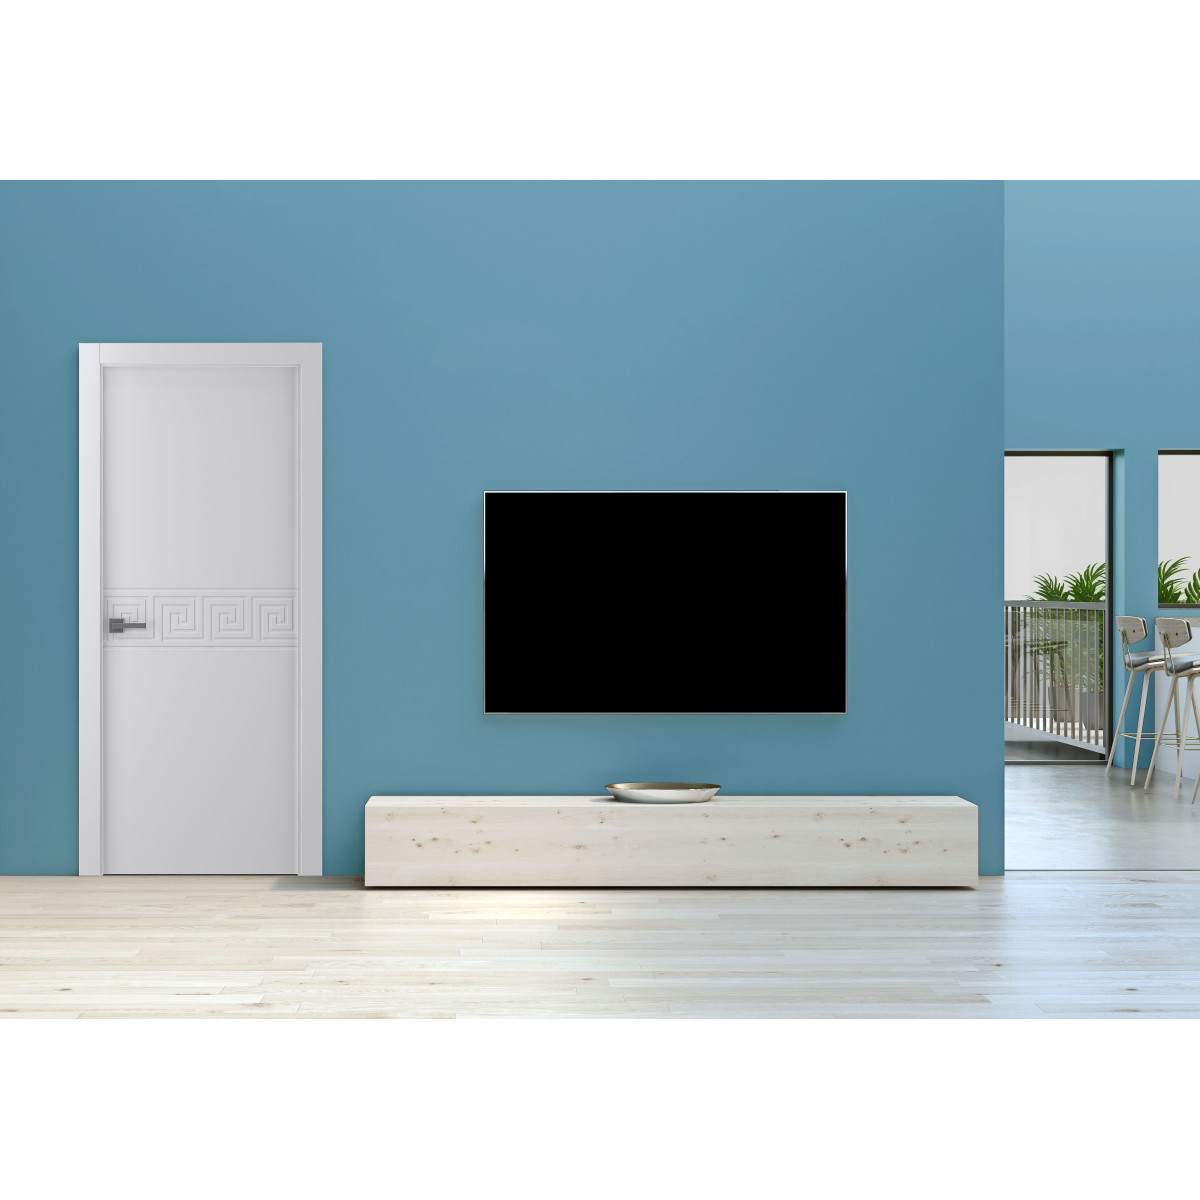 Дверь Межкомнатная Глухая С Замком В Комплекте Афина 80x200 Экошпон Цвет Белый